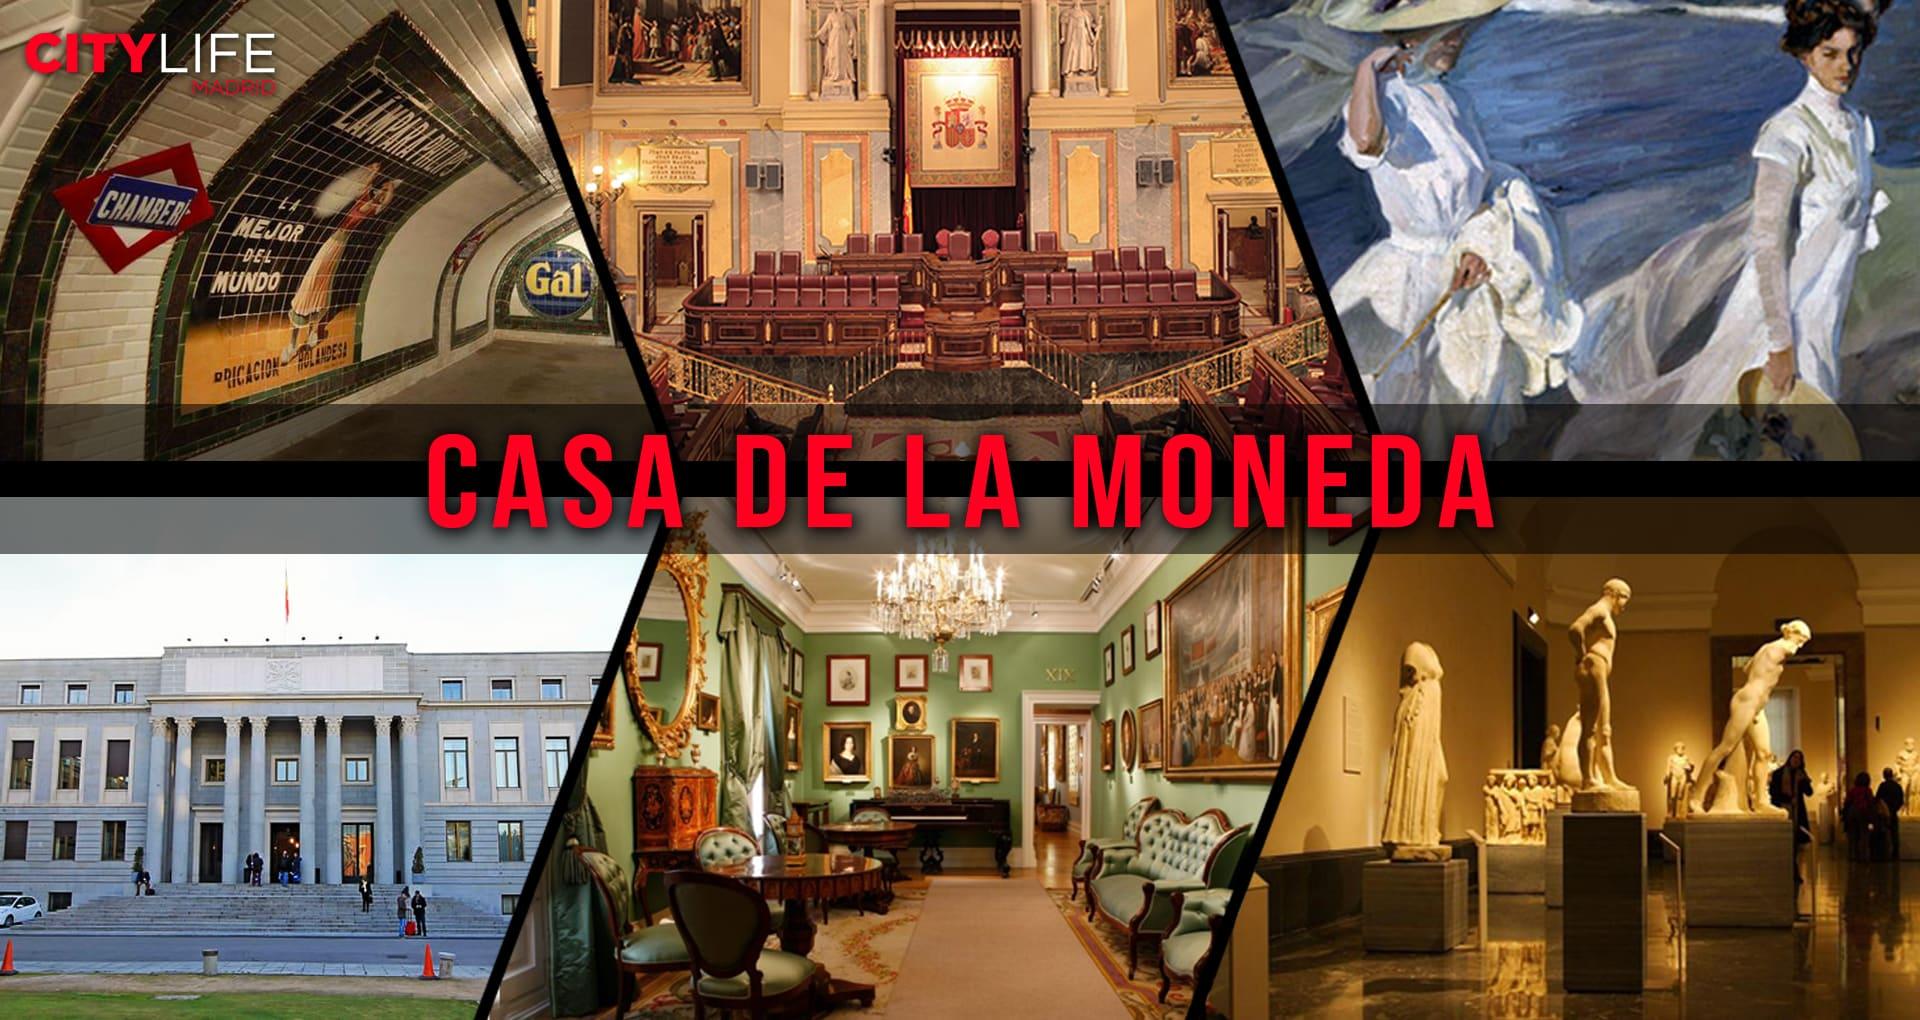 Free Museum Visit: Casa de la Moneda